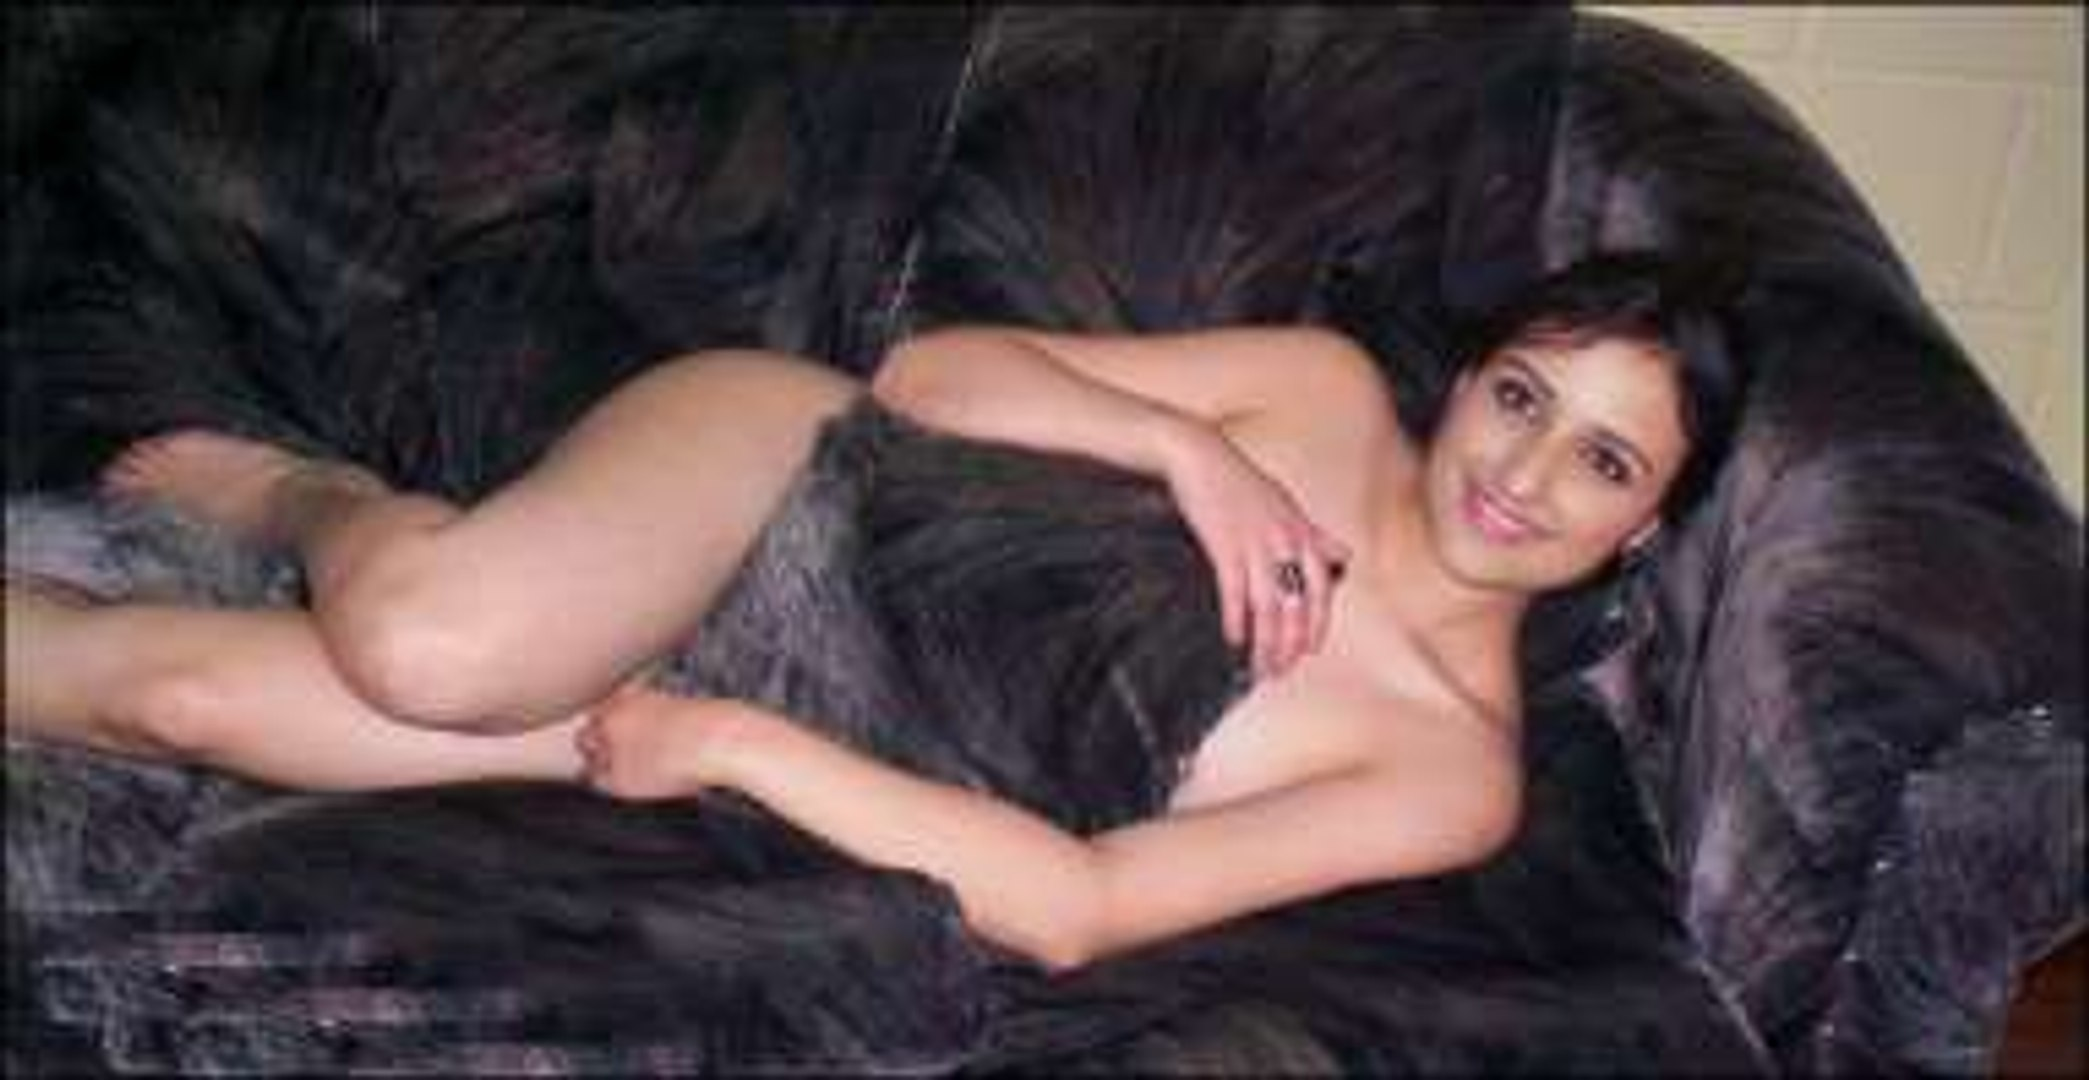 Teen mom poses nude